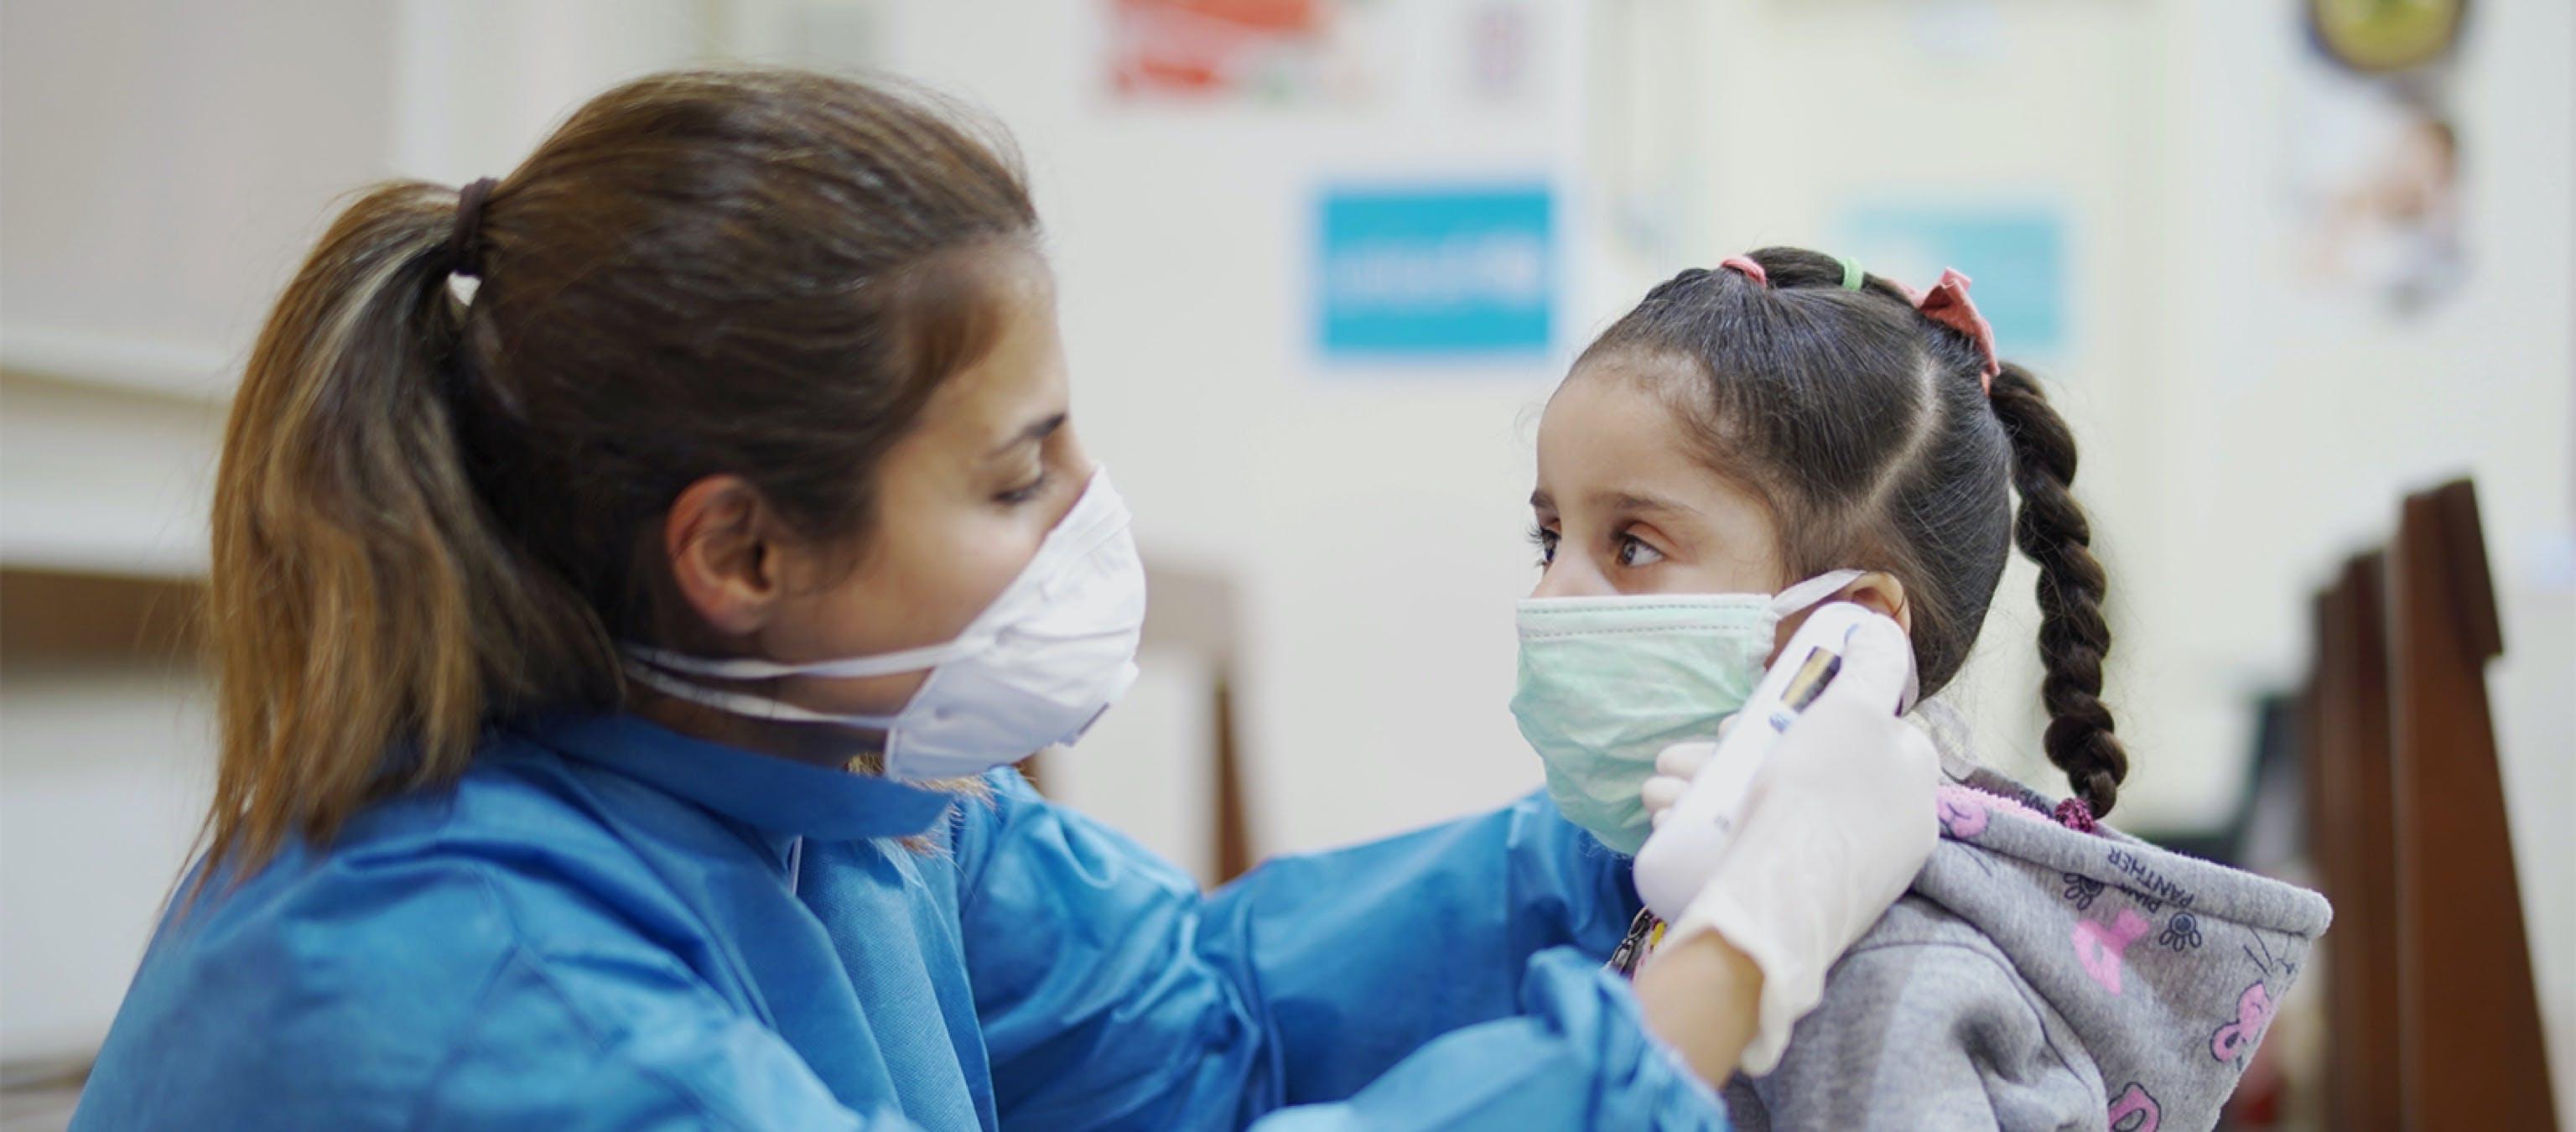 emergenza covid-19, bambina con mascherina